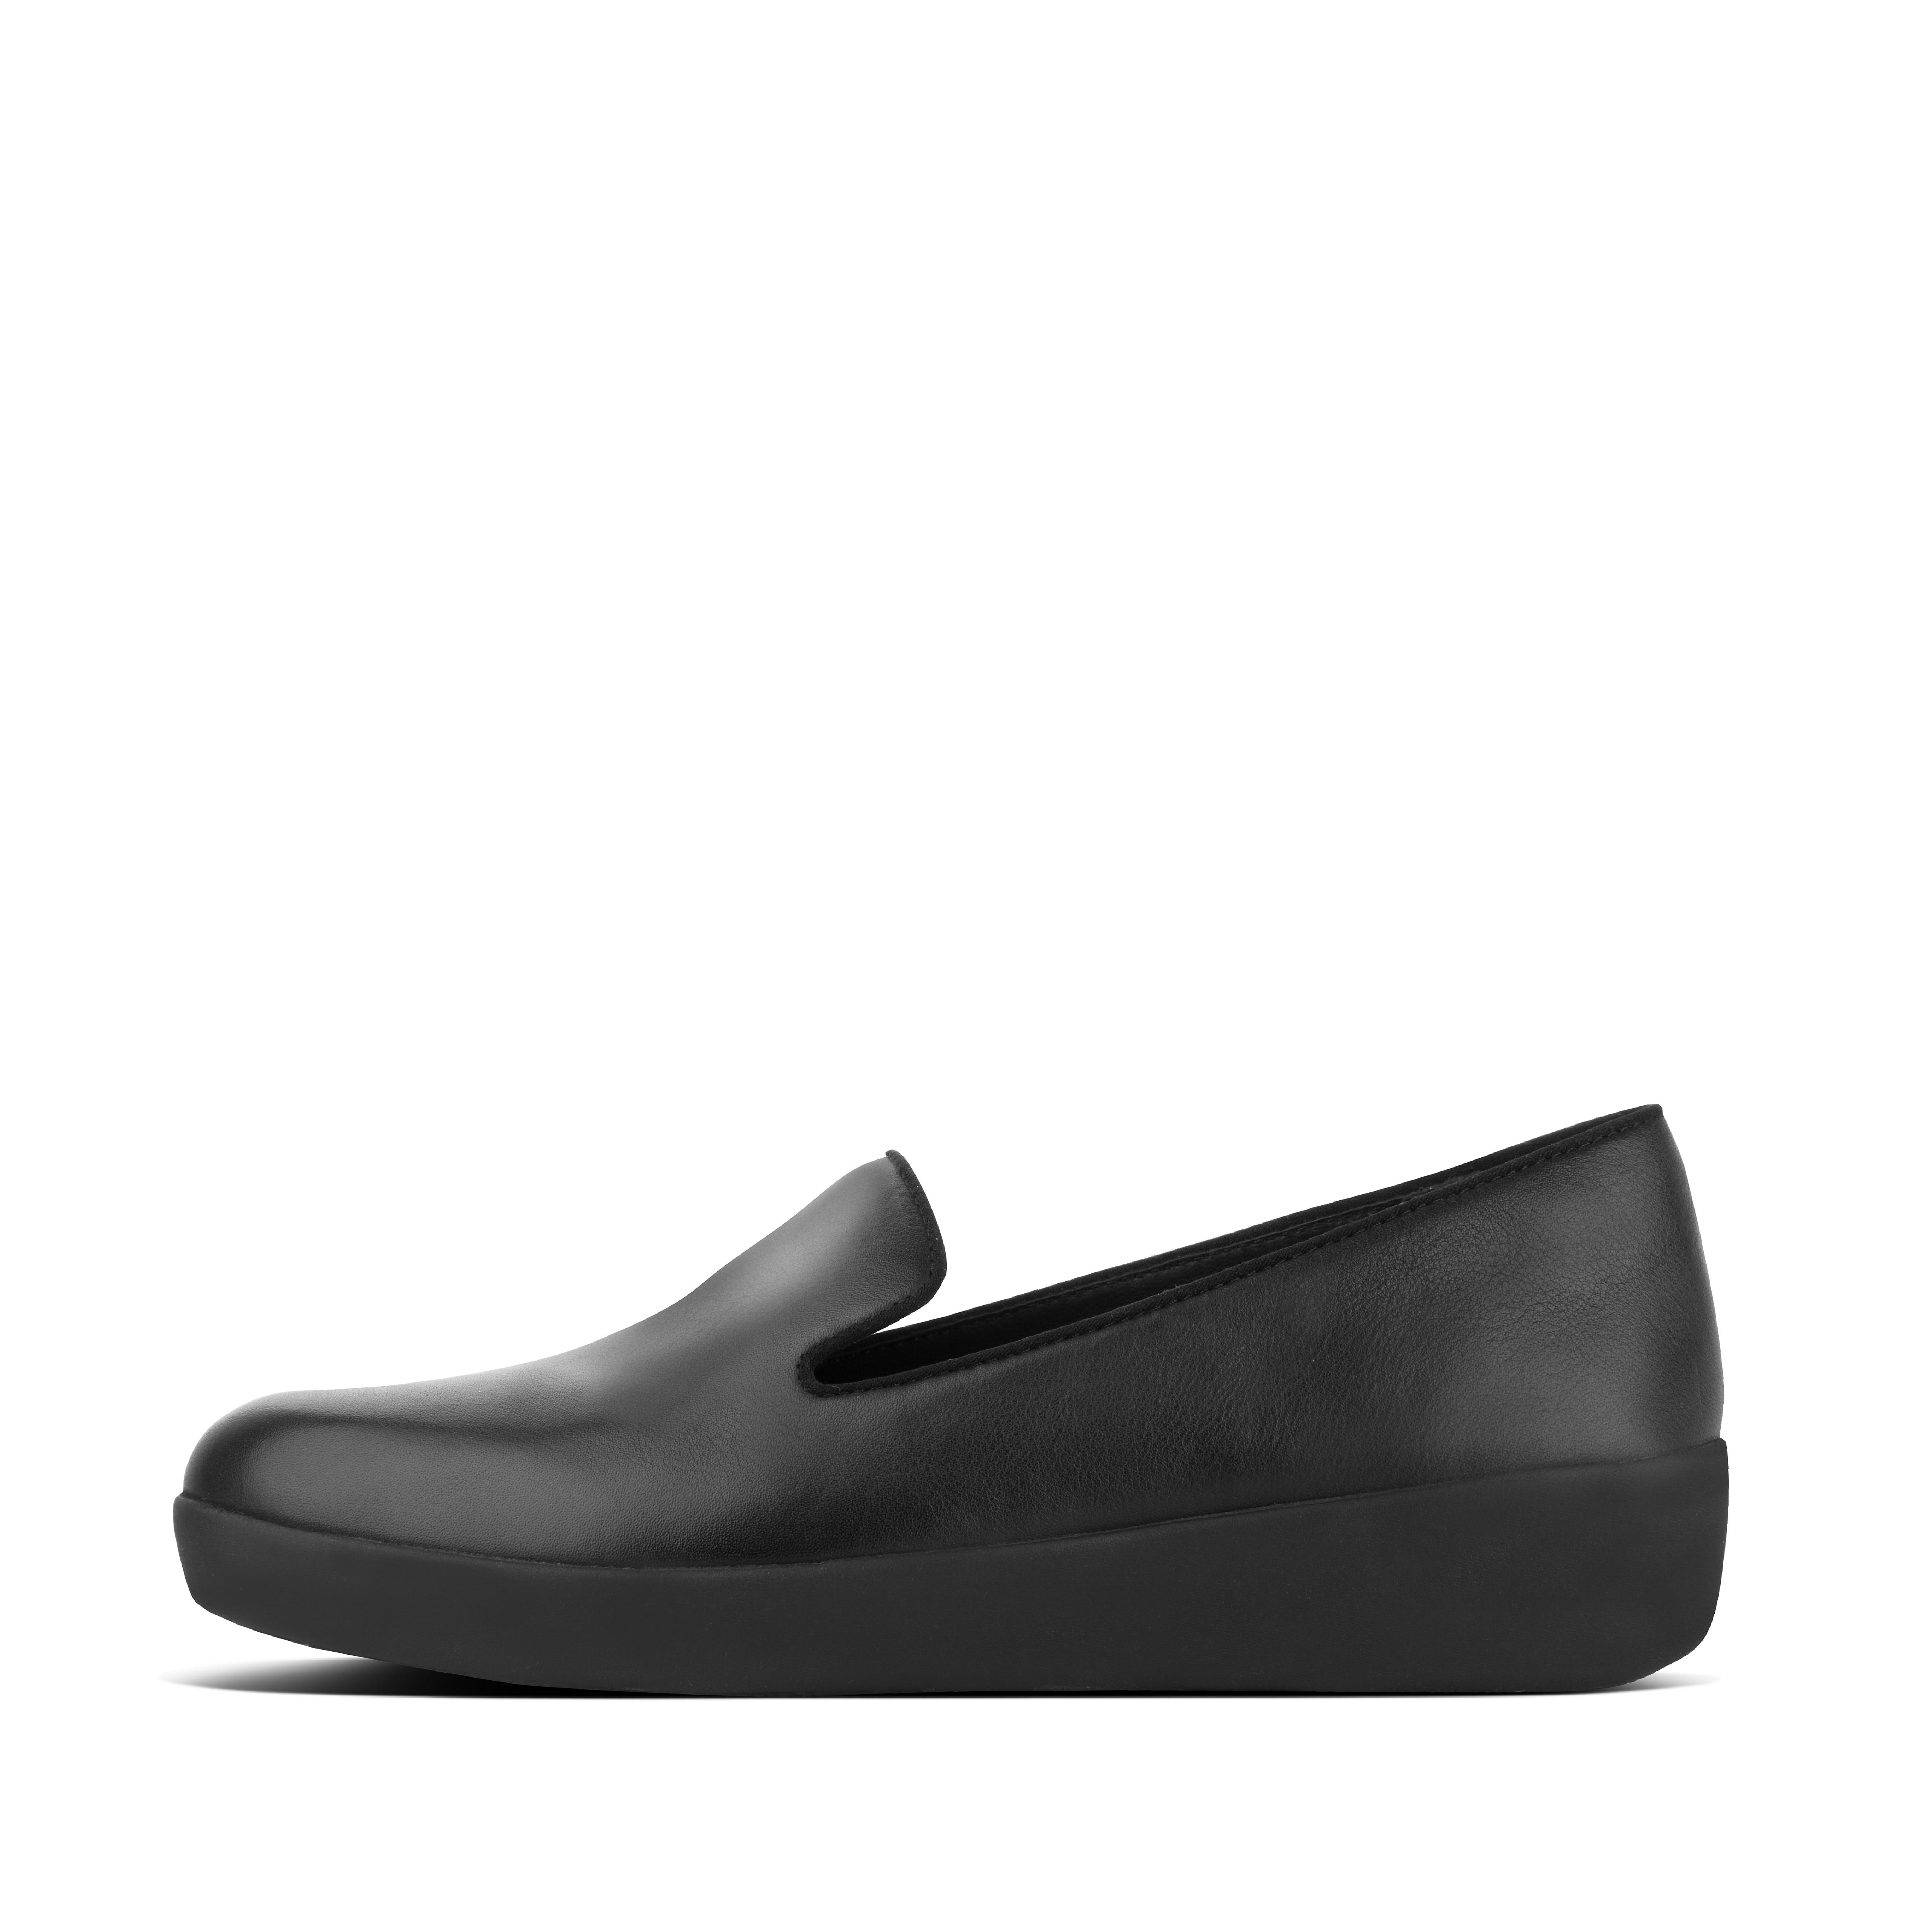 Audrey smoking slippers black m98 001?v=3